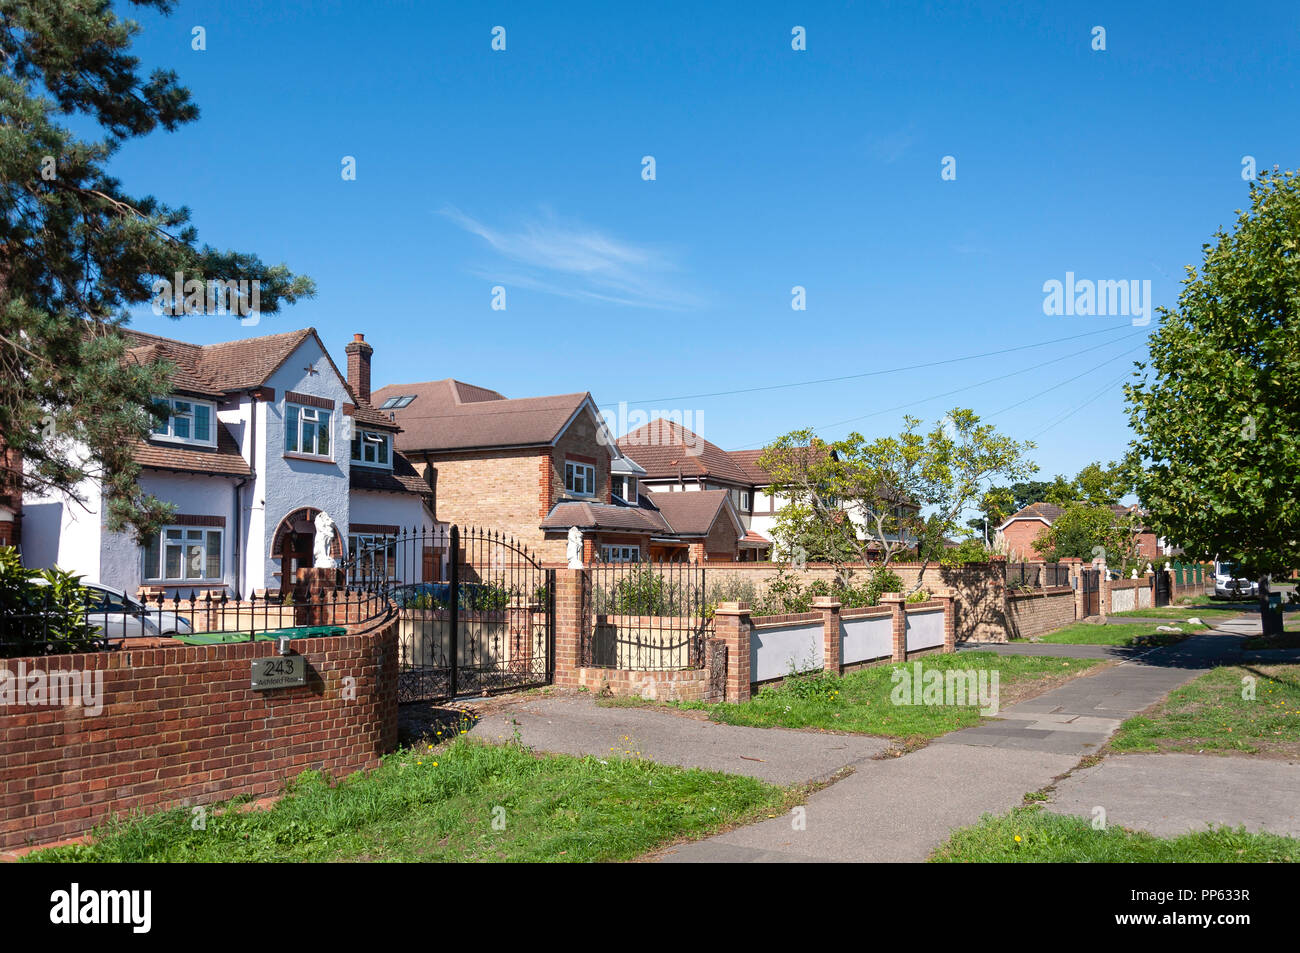 Detached houses on Ashford Road, Laleham, Surrey, England, United Kingdom - Stock Image